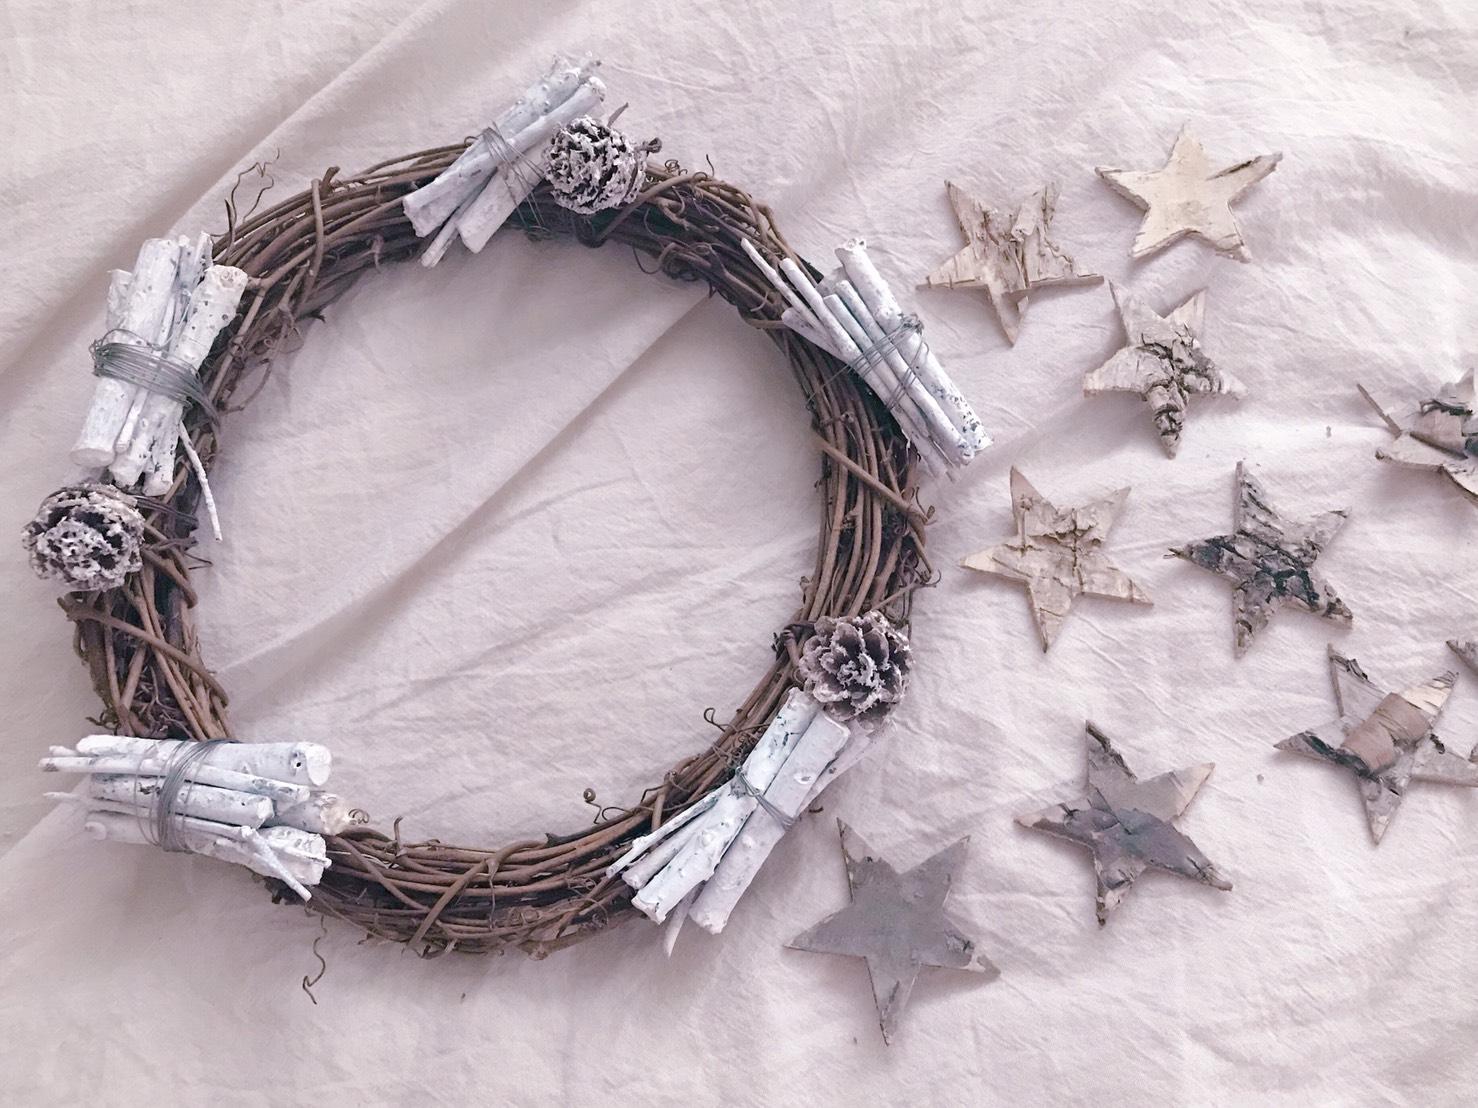 【#Seria】可愛すぎるセリアの新作itemでクリスマスムードを楽しむ♡_4